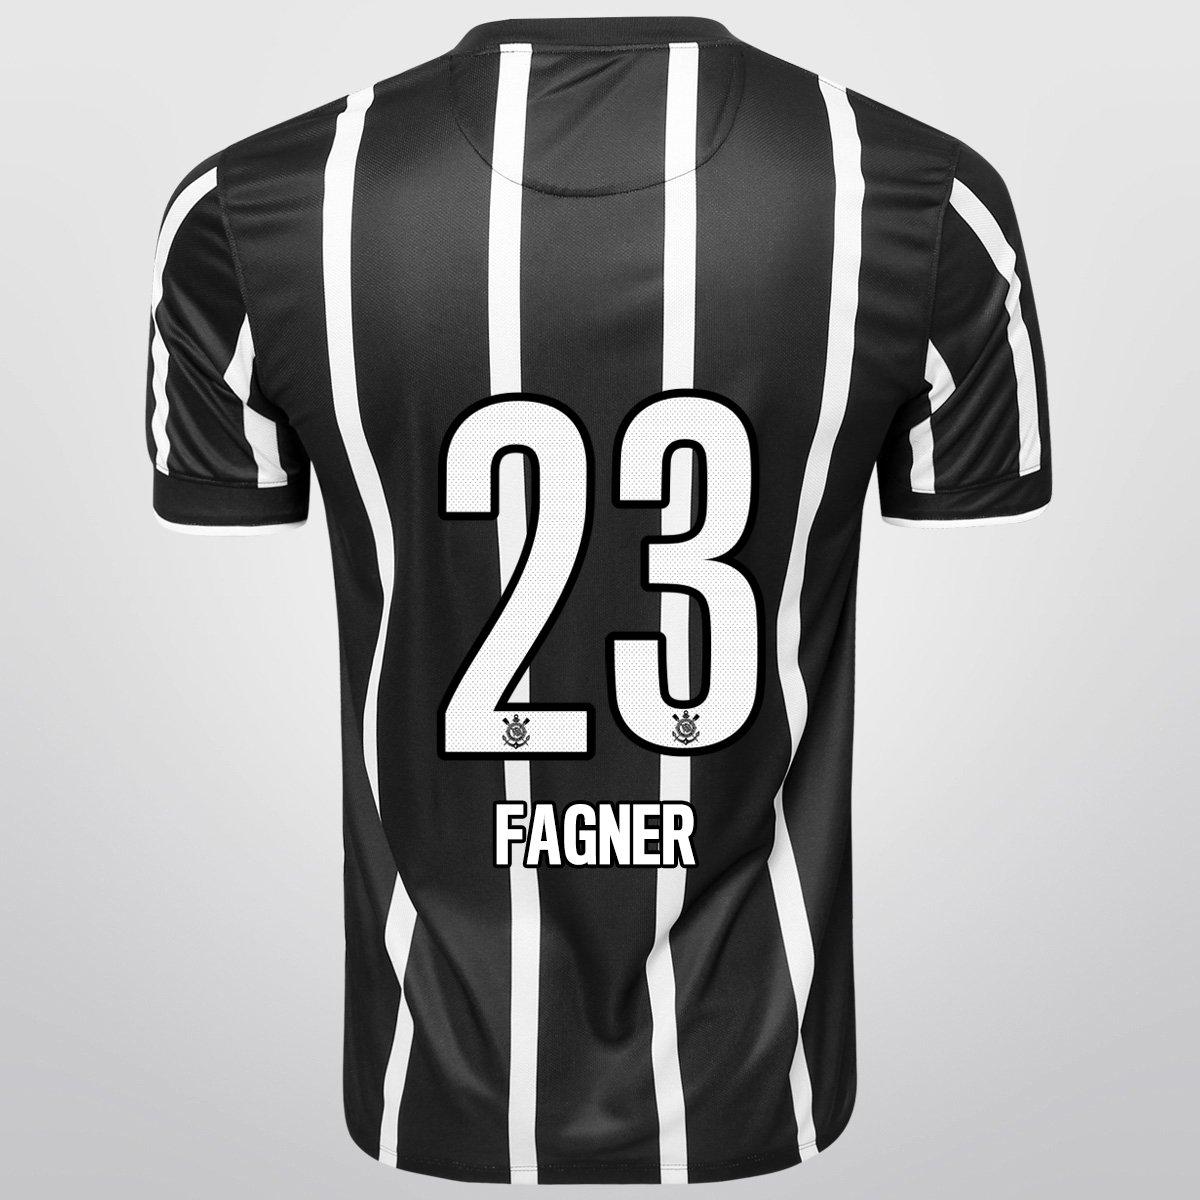 be6932ee2f4e8 Camisa Nike Corinthians II 14 15 nº 23 - Fagner - Compre Agora ...